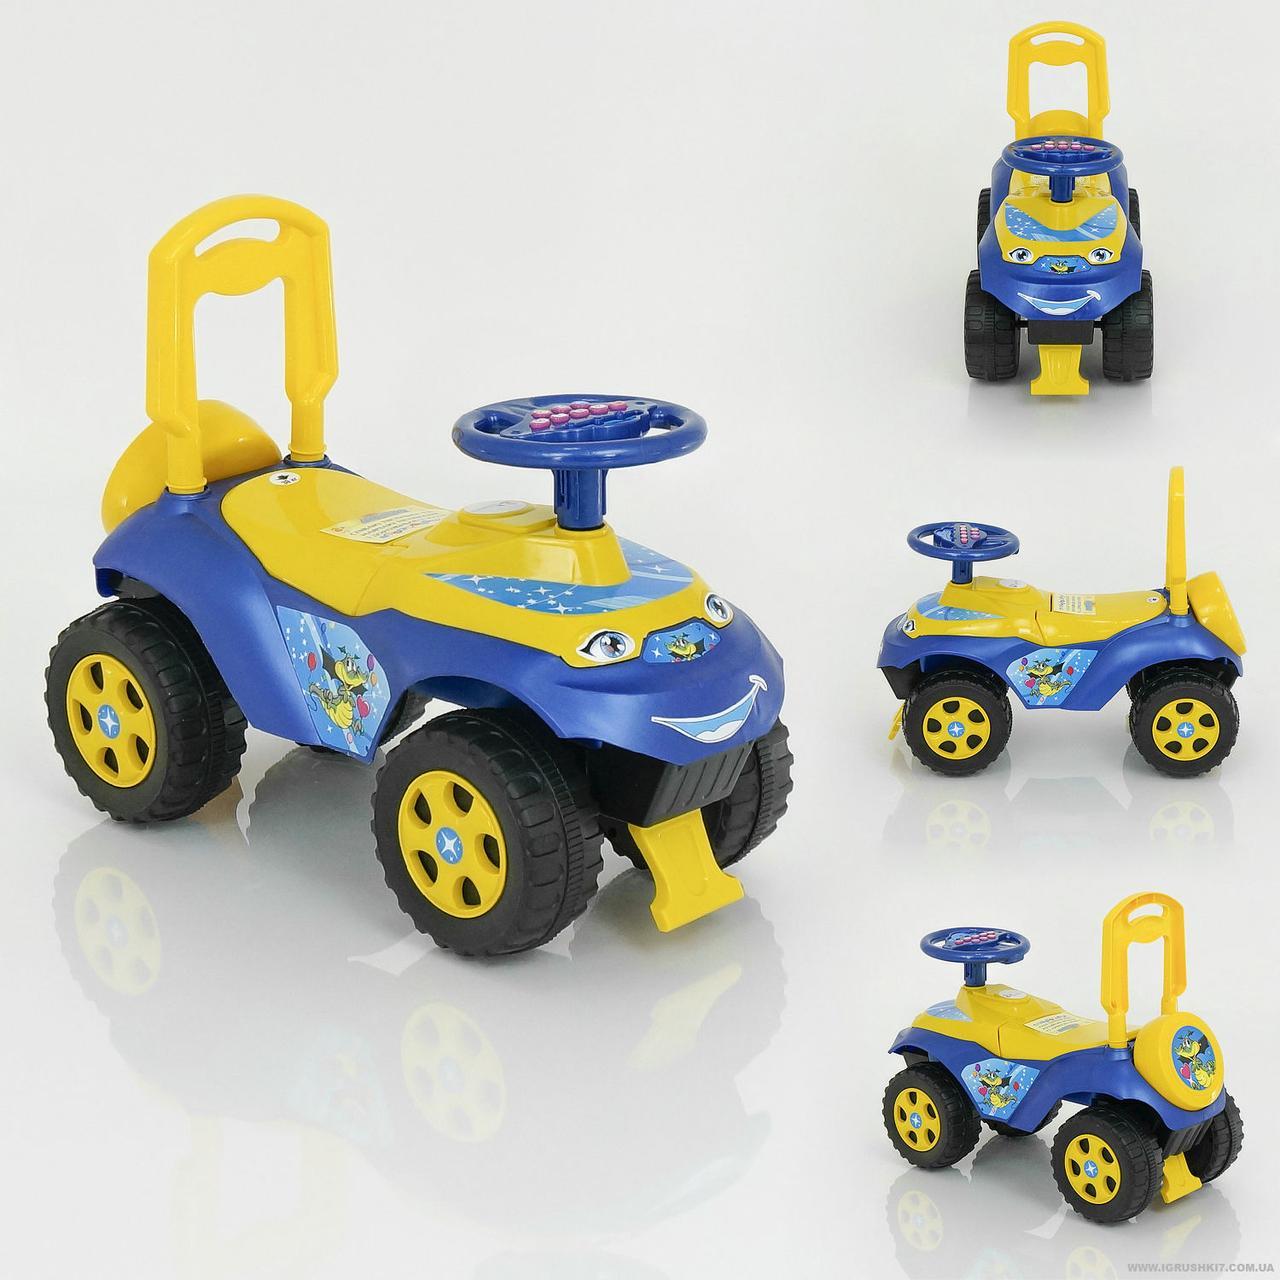 Машина каталка толокар Автошка 0142/U/04 желто-синий Фламинго музыкальный